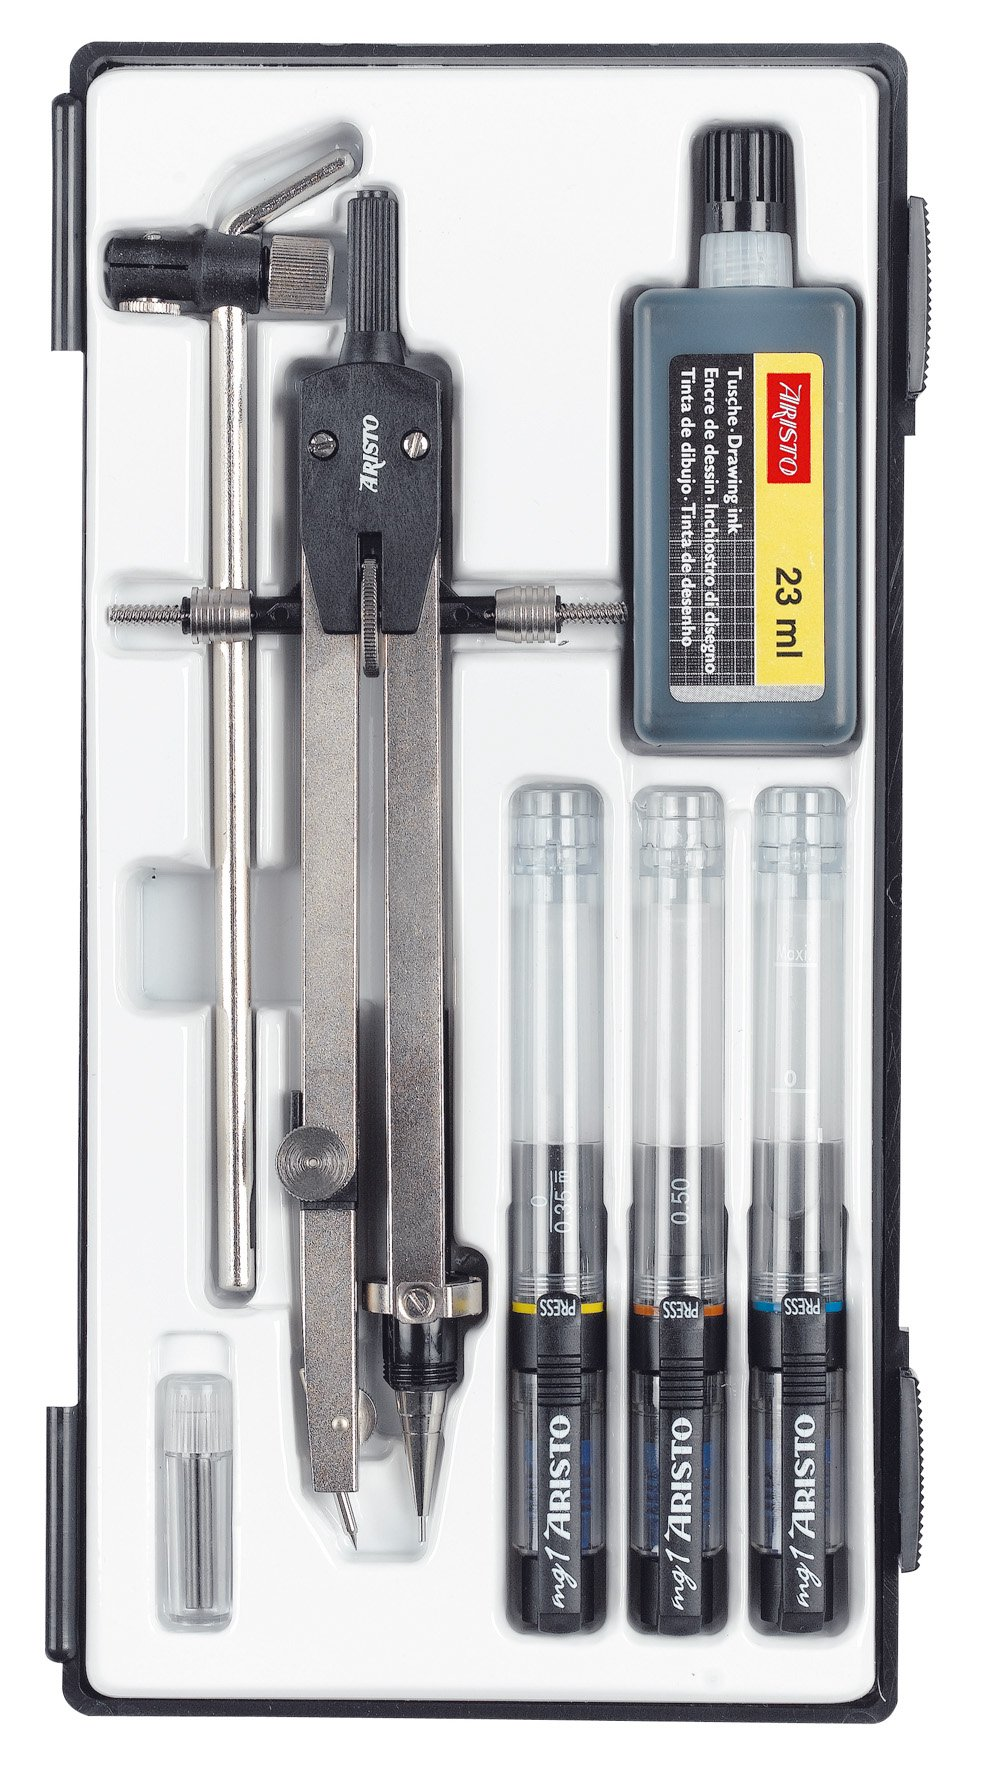 Aristo MG1 AR64170 Professional Technical Drawing Pen Set